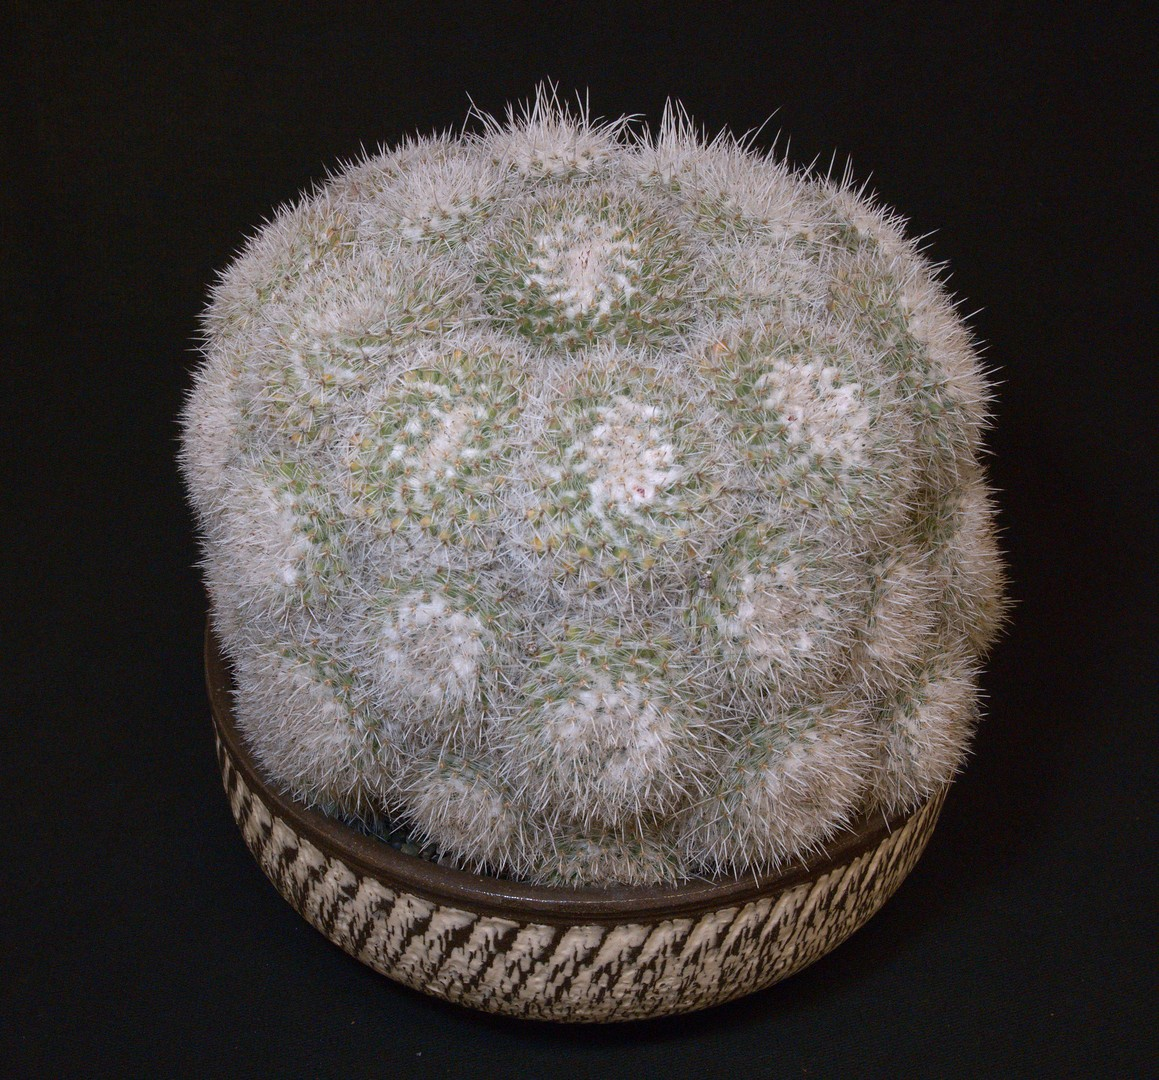 SCCSS 2020 January - Winner Open Cactus - Jim Gardner - Mammillaria geminispina